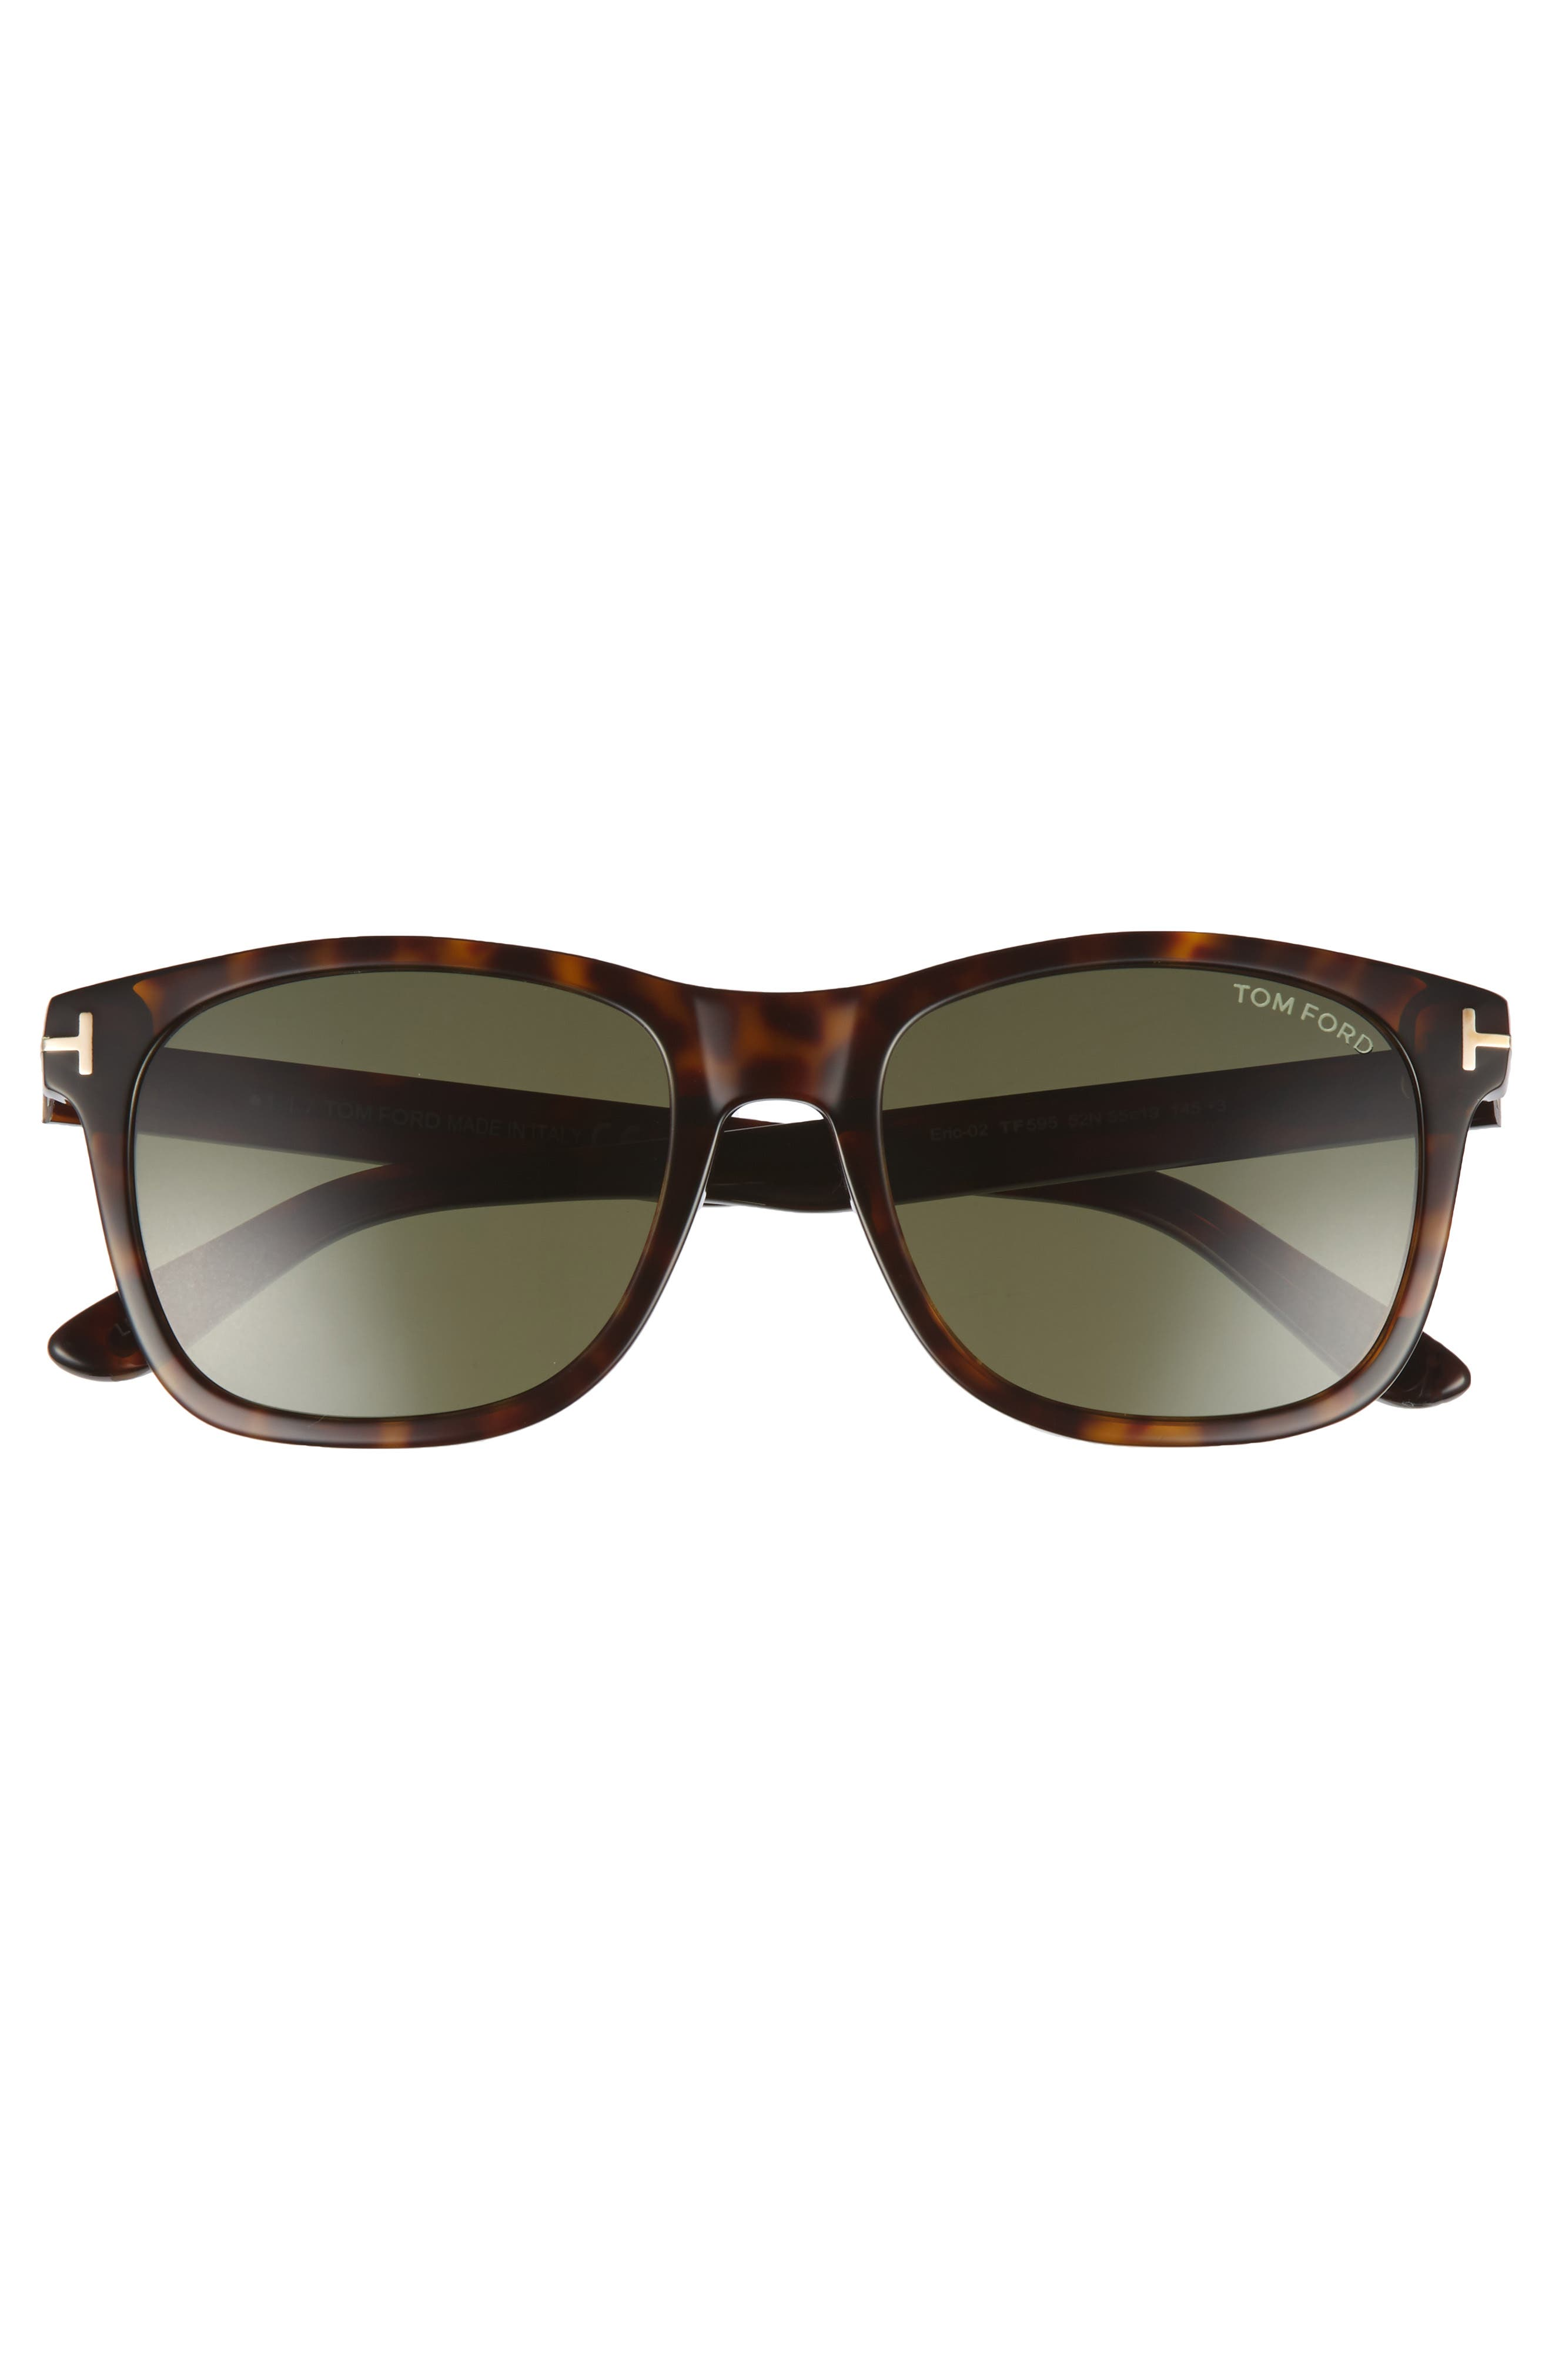 Eric 55mm Sunglasses,                             Alternate thumbnail 2, color,                             Dark Havana/ Green